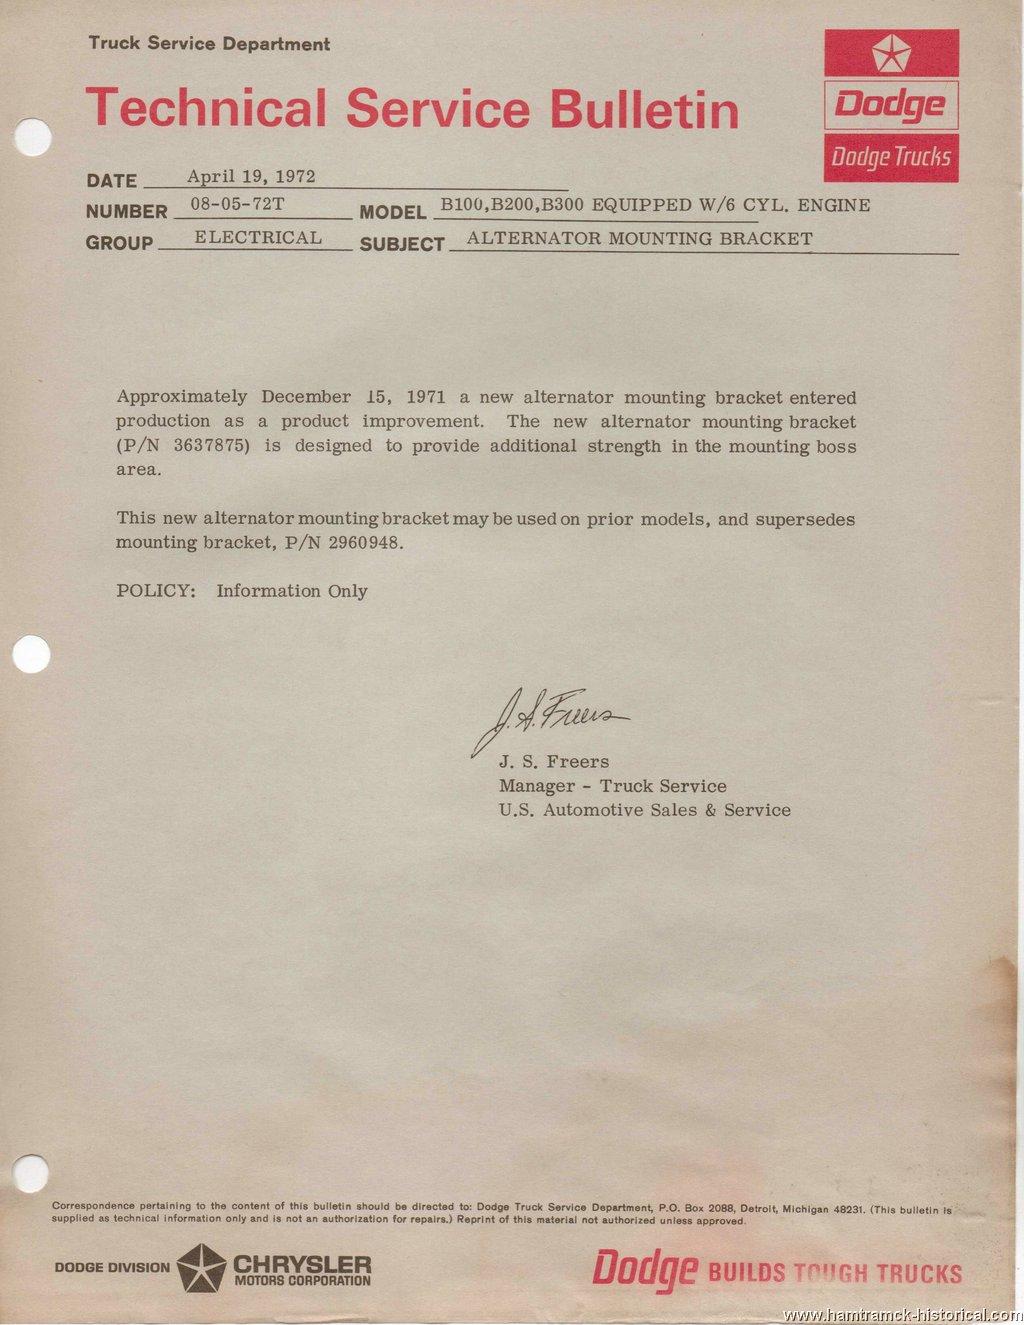 The 1970 Hamtramck Registry 1972 Dodge Tsbs Page Charger Alternator Wiring Engine 1